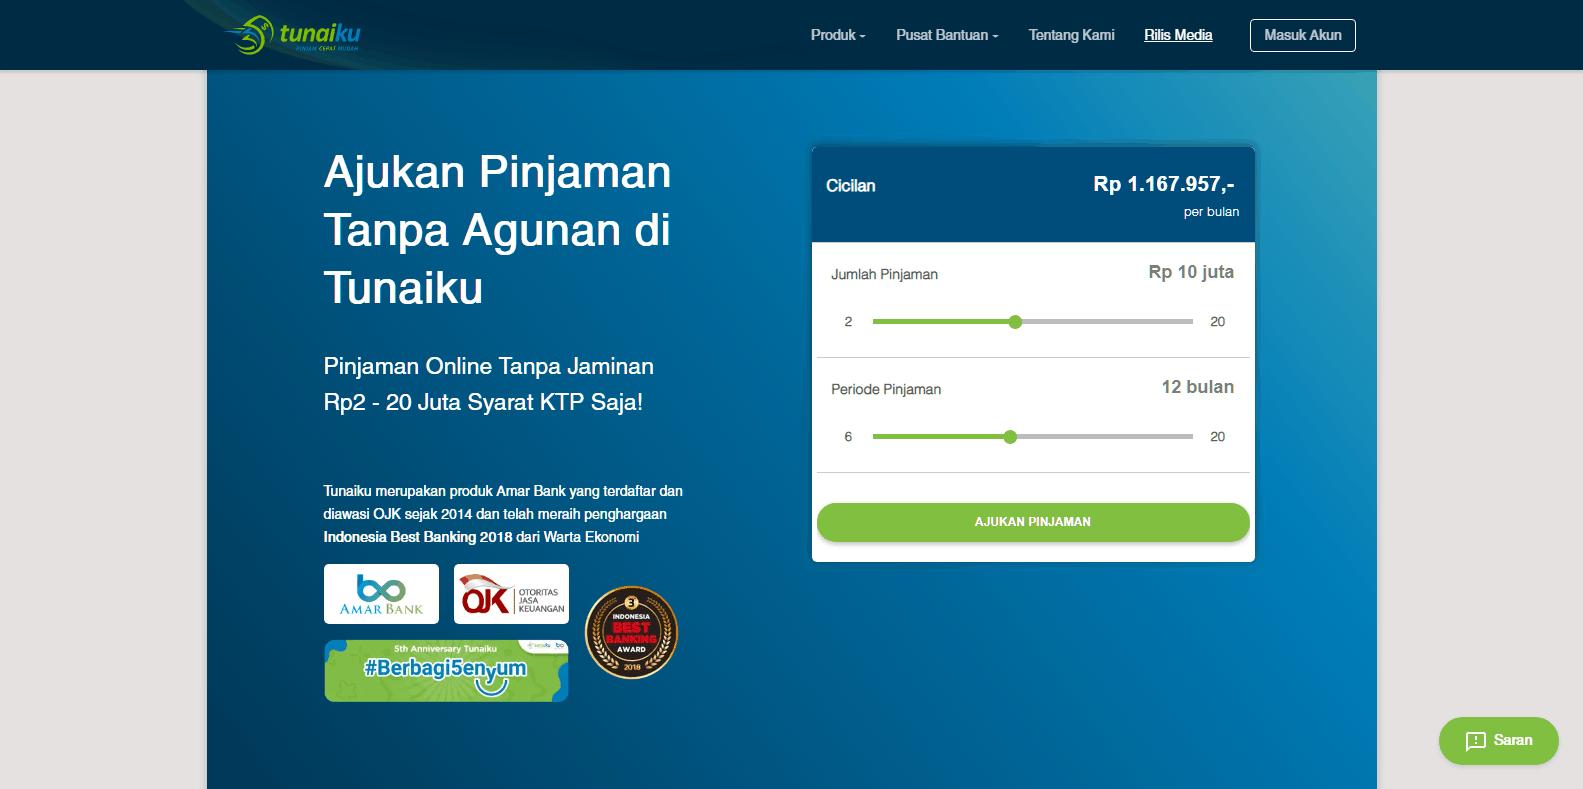 Gunakan sistem syariah · 3. Tunaiku Pinjaman Online Tanpa Jaminan 2020 Bunga Tips Disetujui